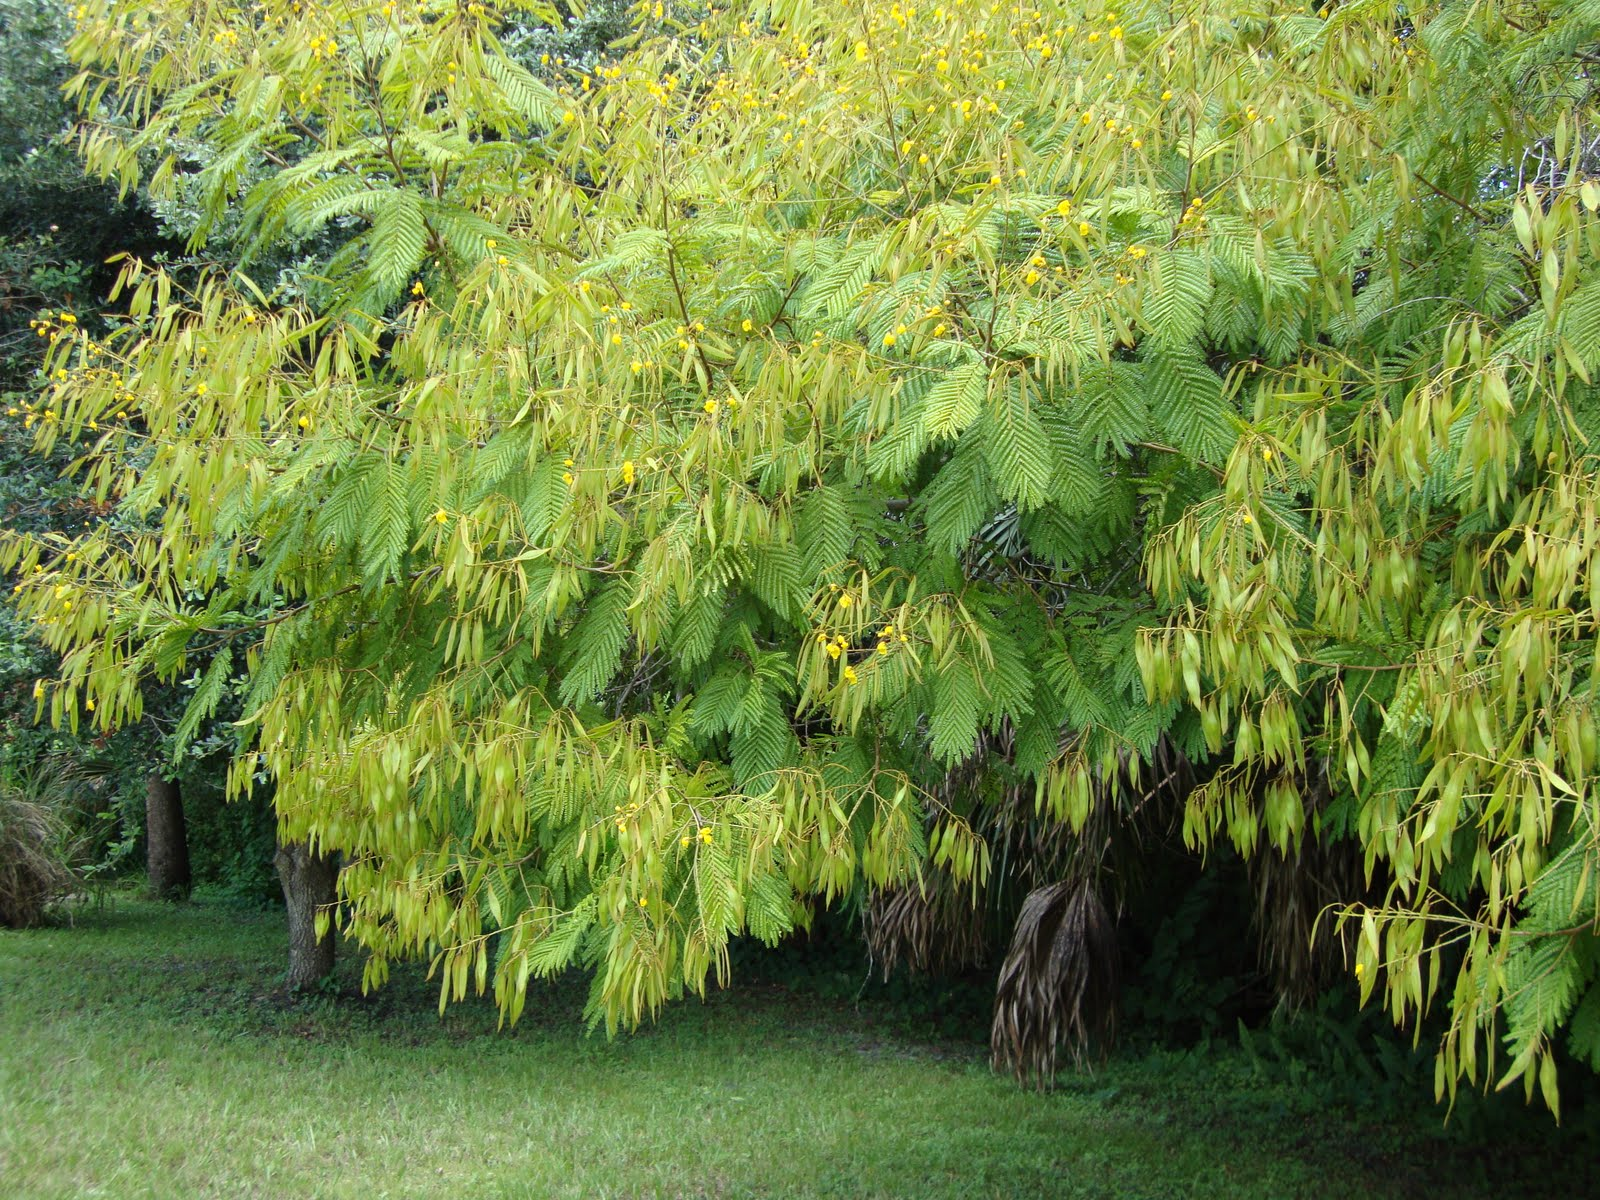 Around Grandmas Table Flowering Trees Of Ruskin Part 3